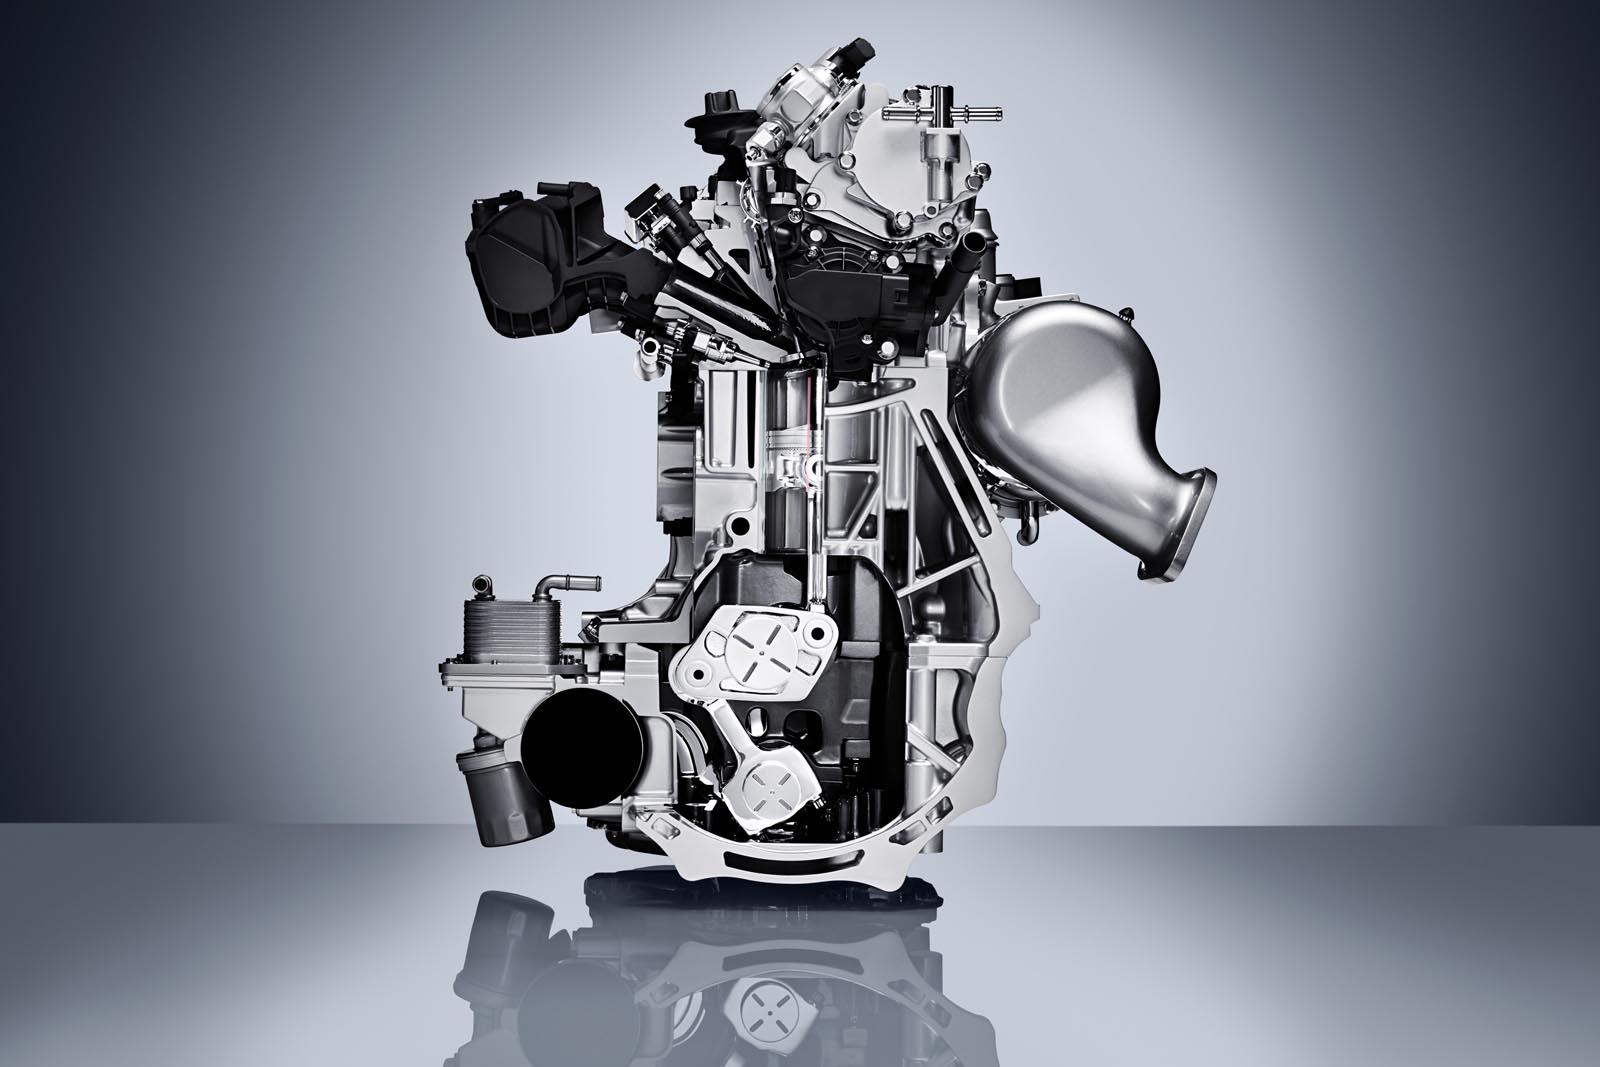 Photo of O κινητήρας Infiniti VC-Turbo στην λίστα του Wards